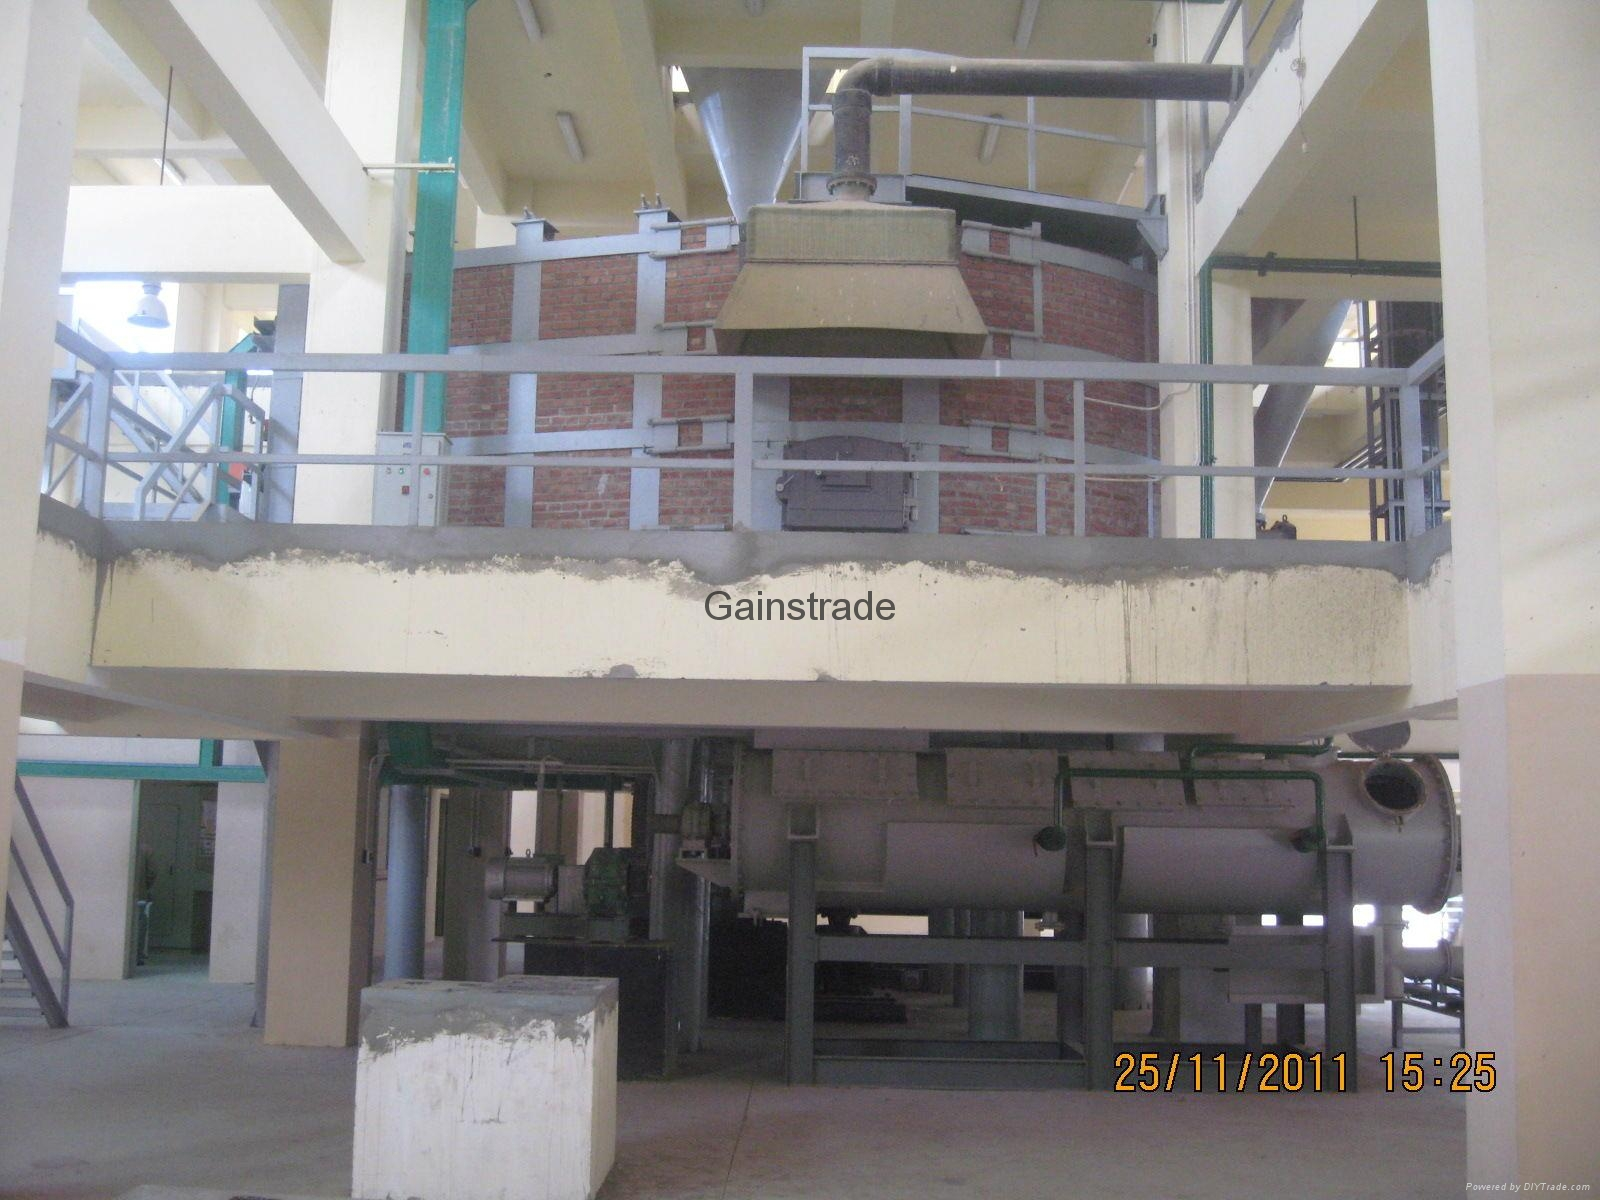 Mannheim potassium sulphate production line 1